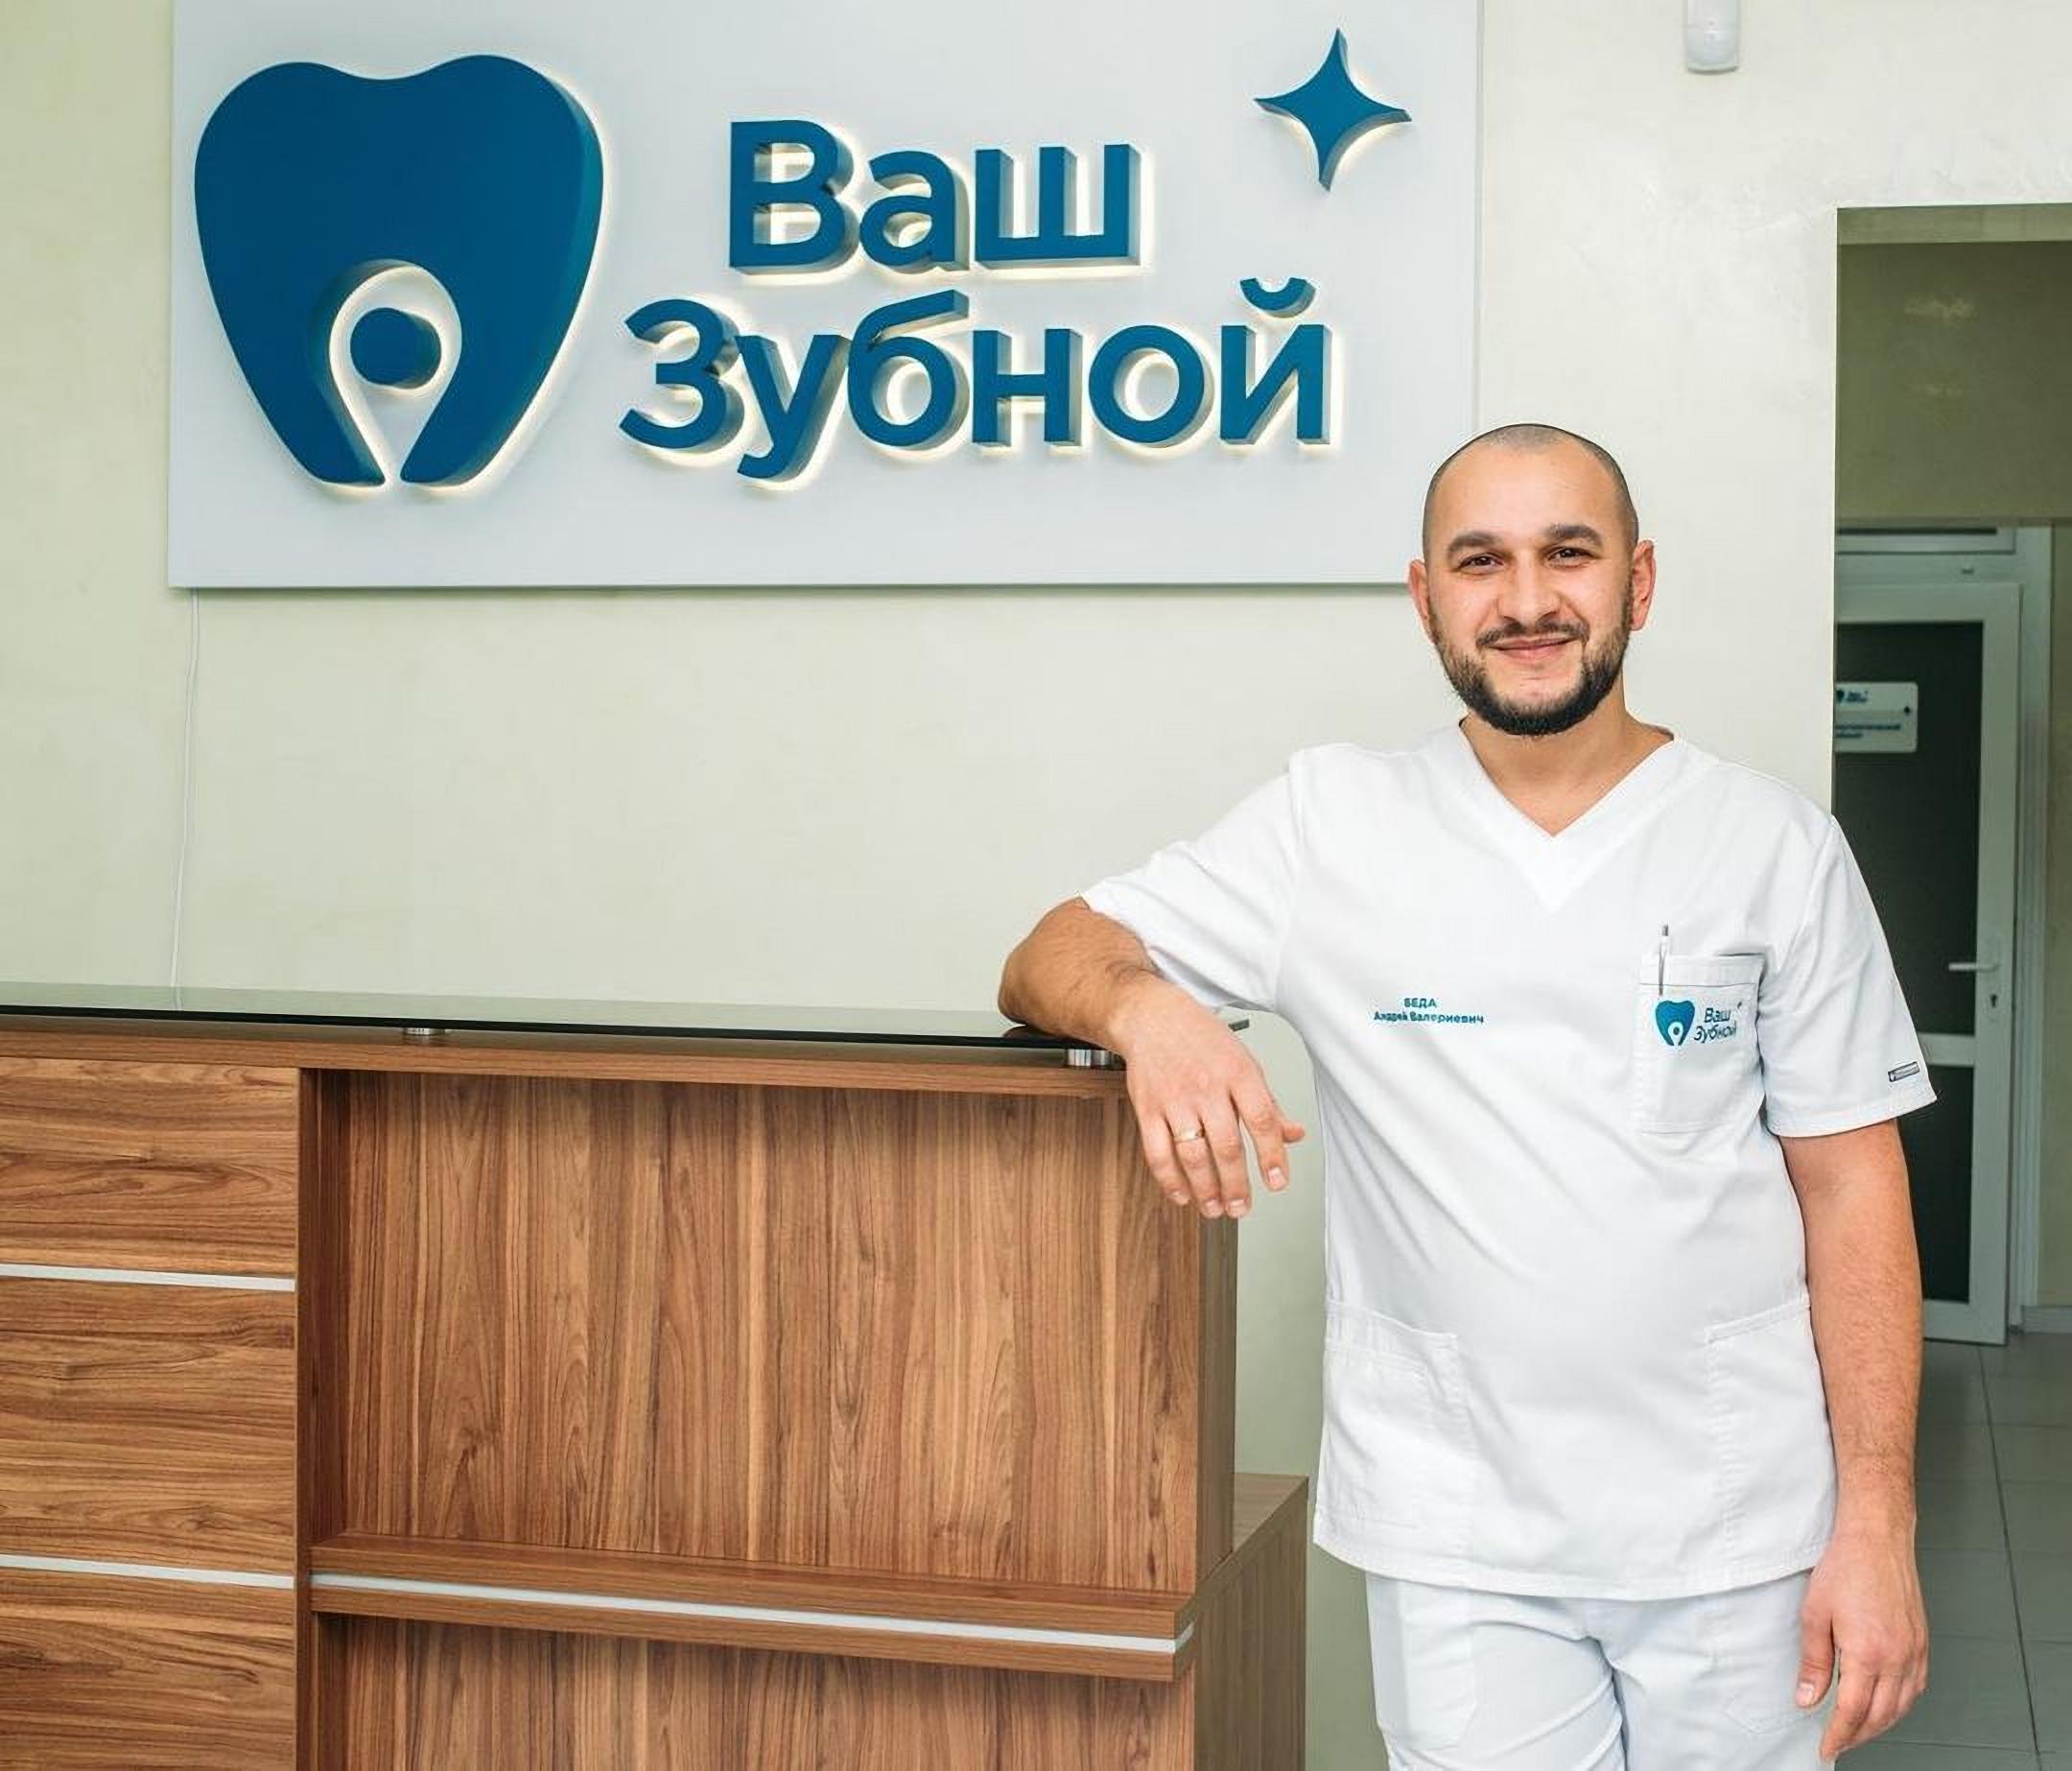 Founder of Your dental clinic in Odessa Ukraine